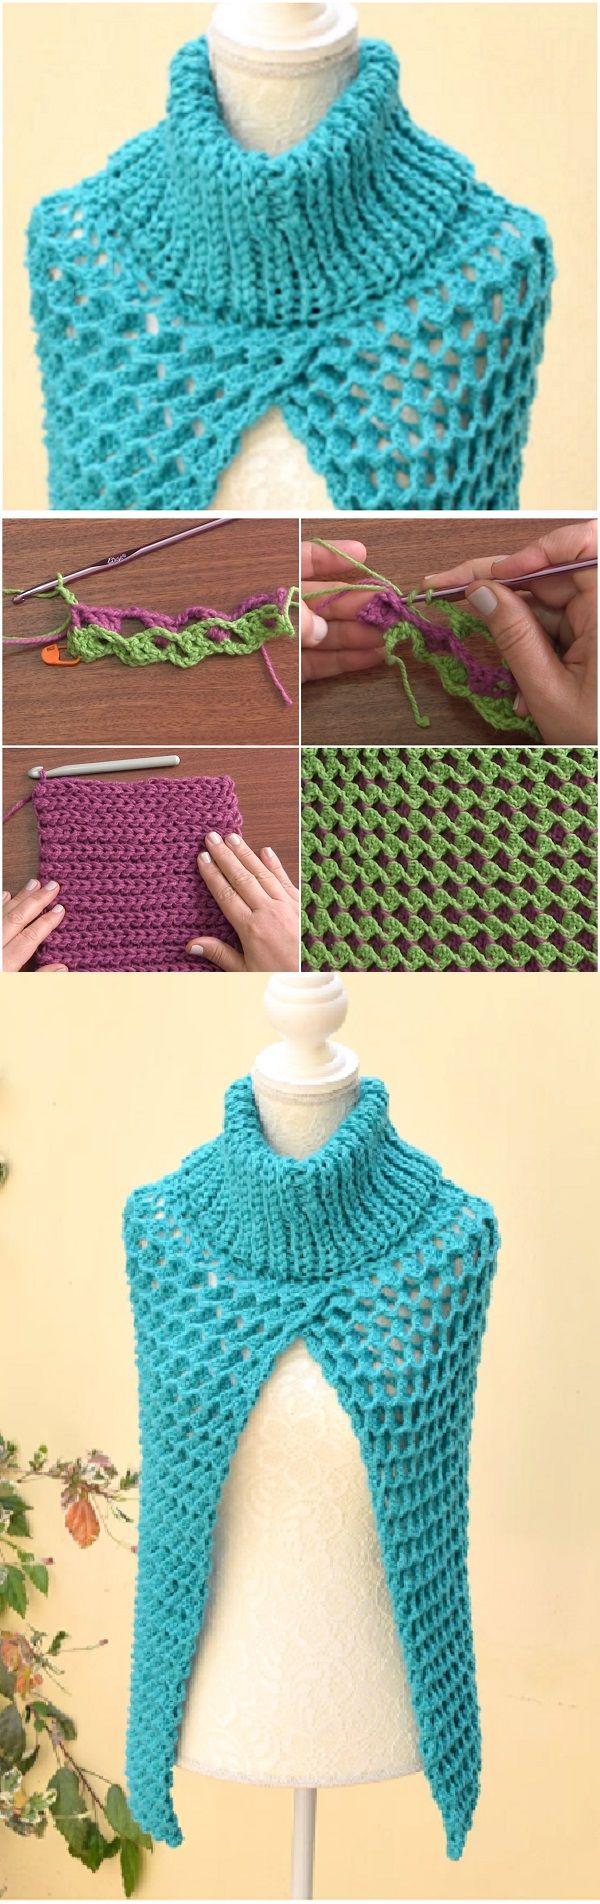 621 best Crochet images on Pinterest | Padrinos de boda, Bordado y ...